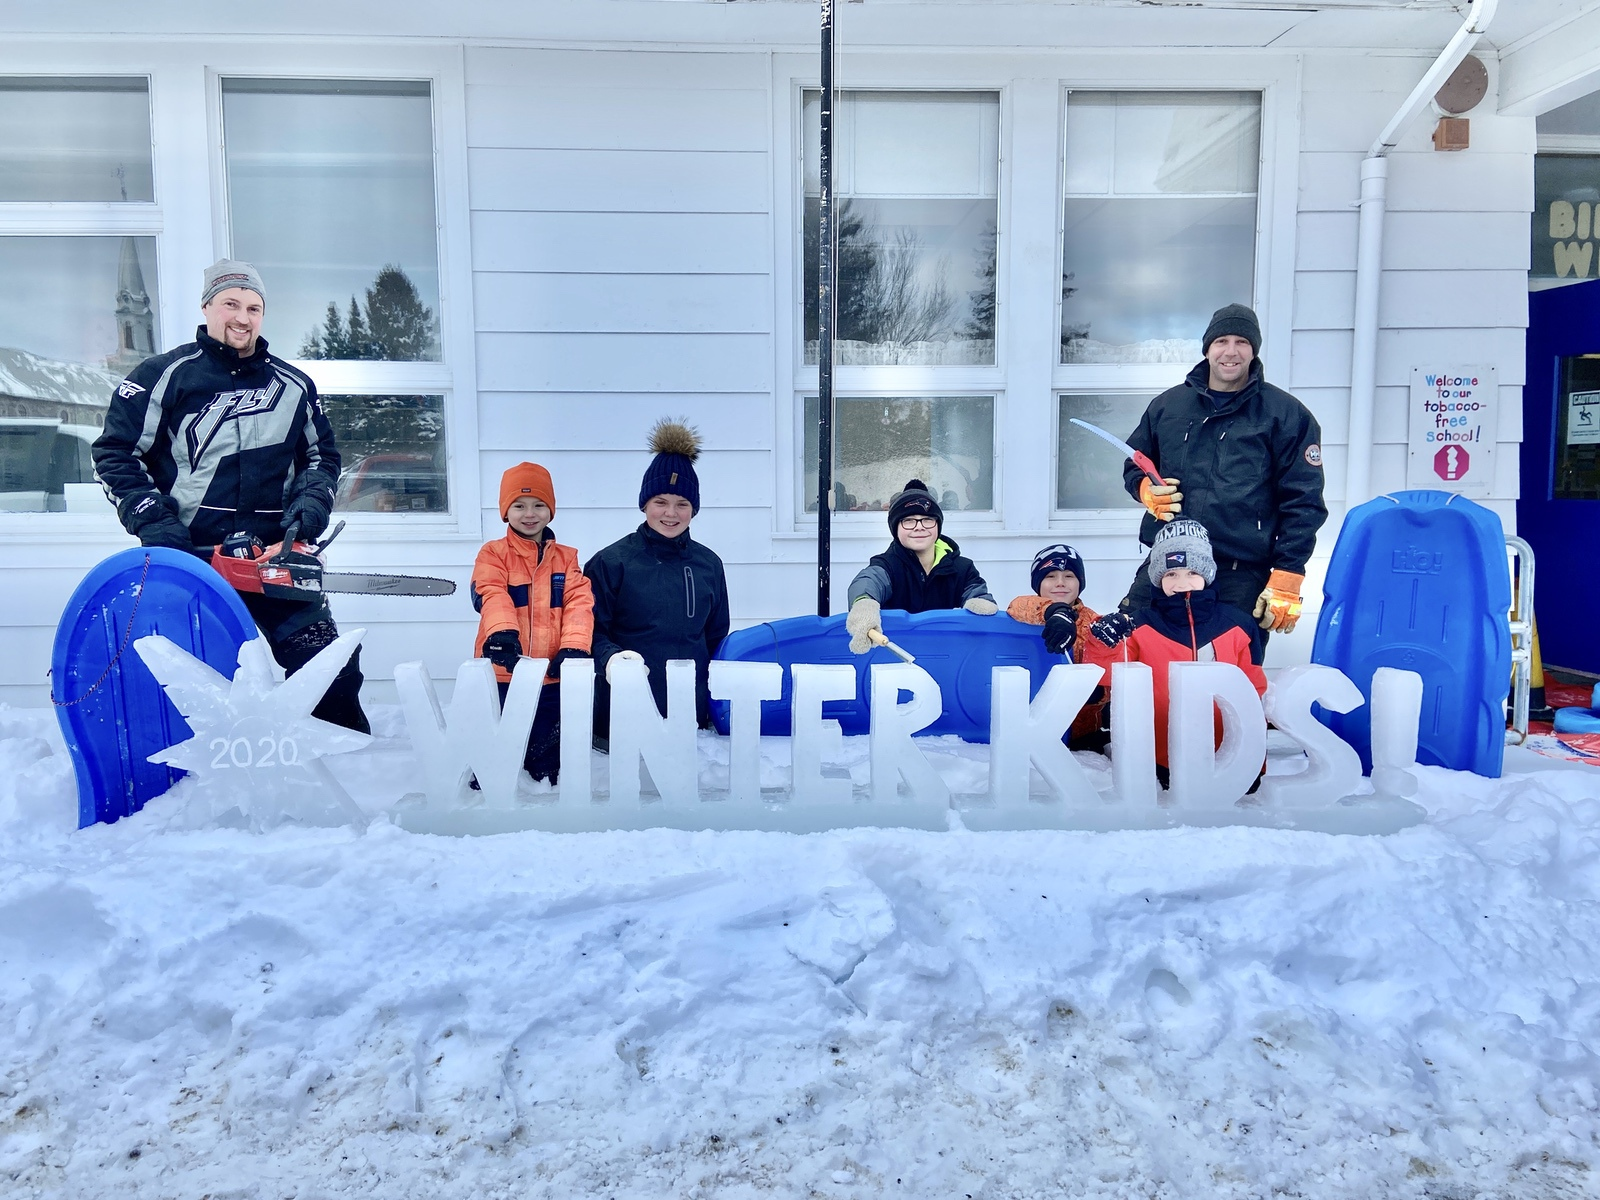 12 Ideas for Outdoor Winter Fun Winter Games 2020 Week 3 Dr Levesque Elementary School